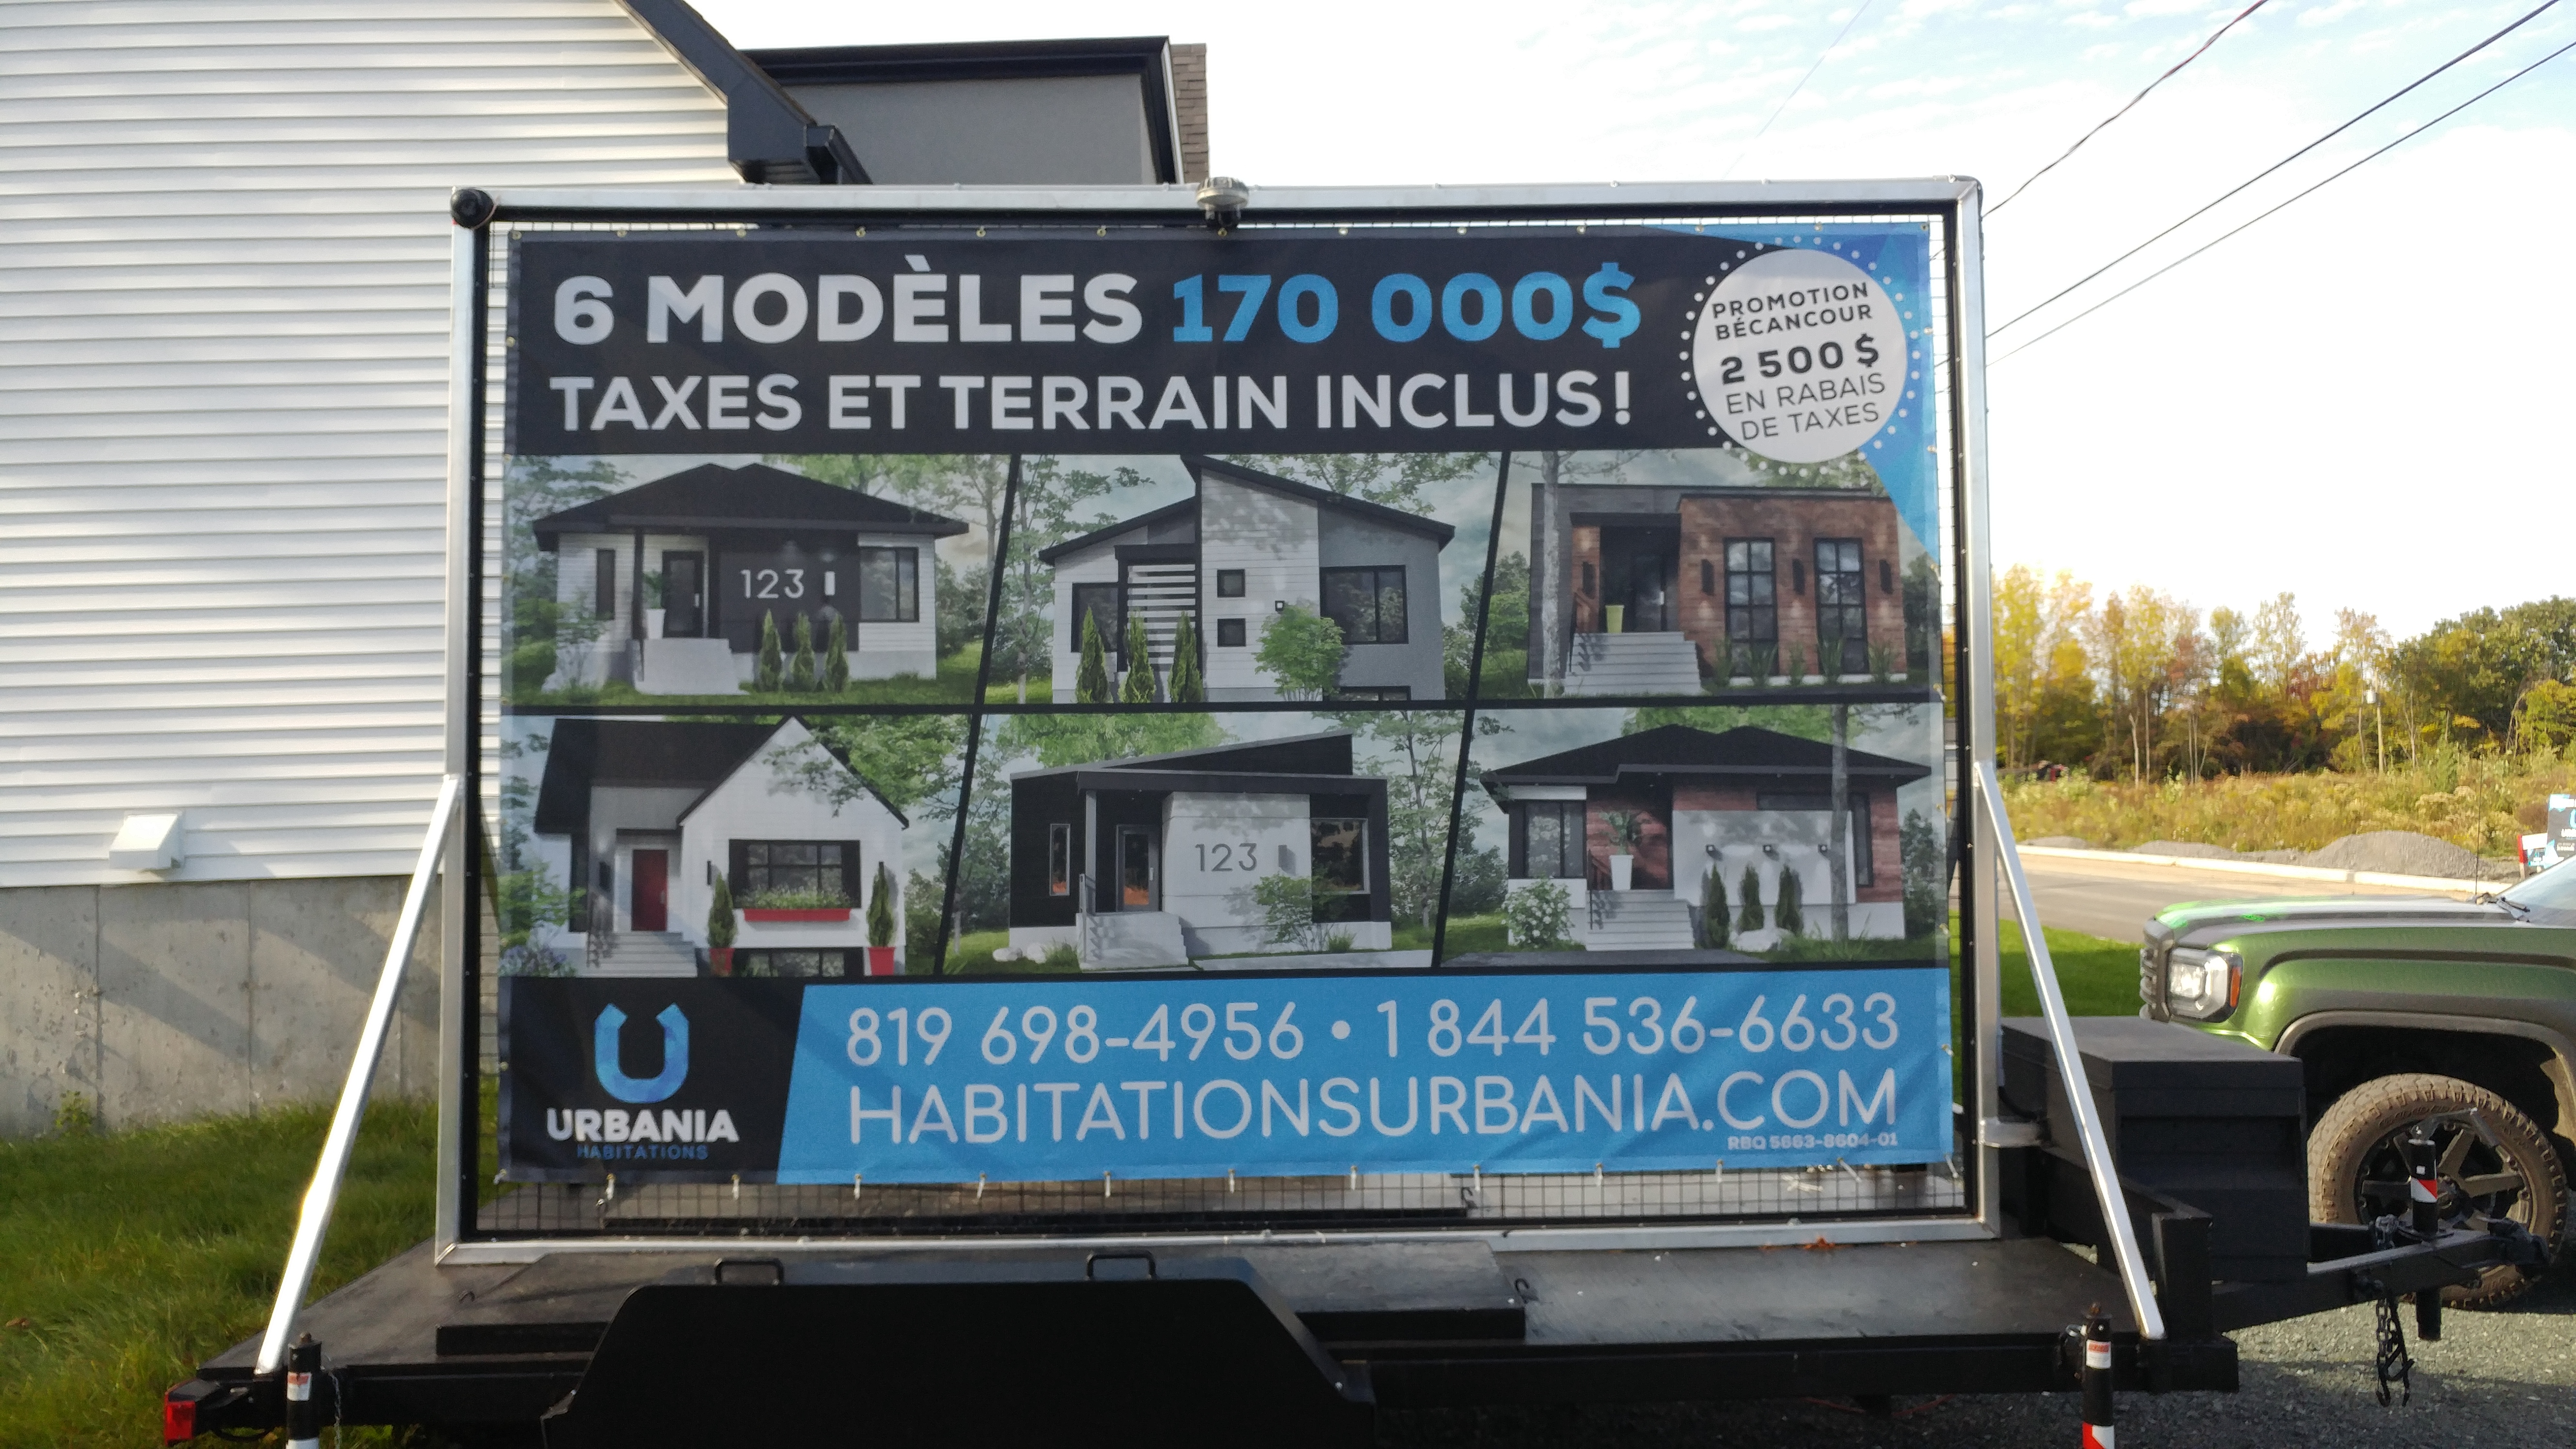 Panneau publicitaire - Habitations Urbania